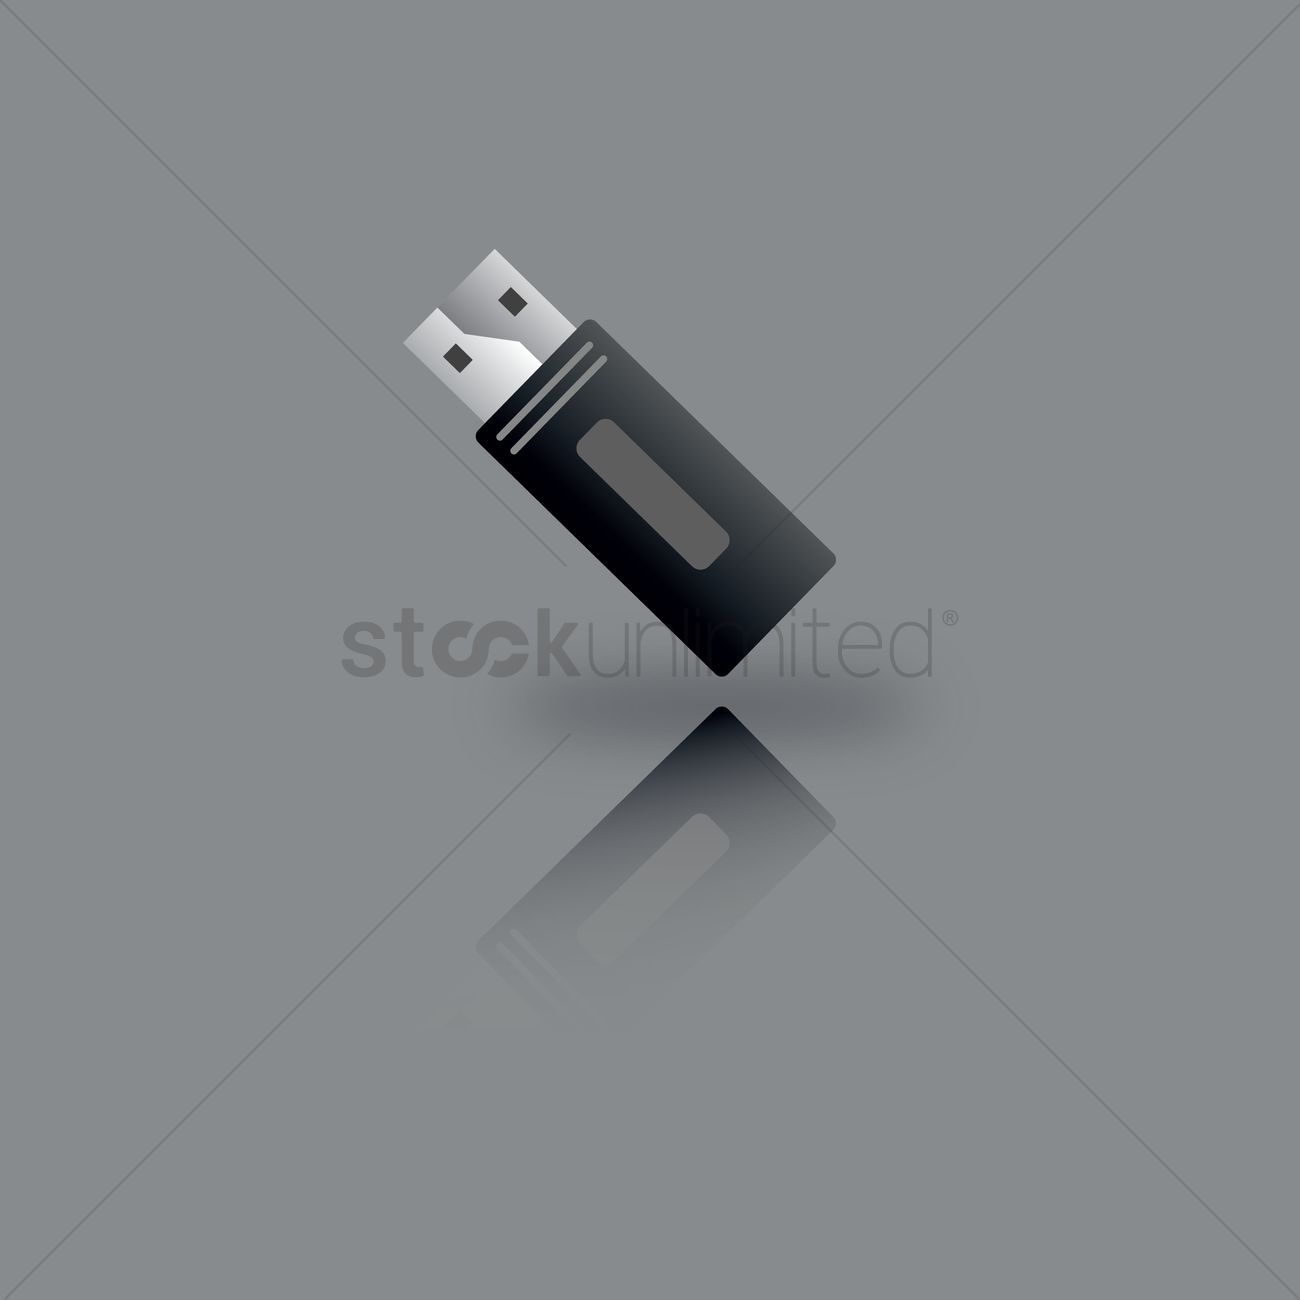 Usb flash drive vector illustration